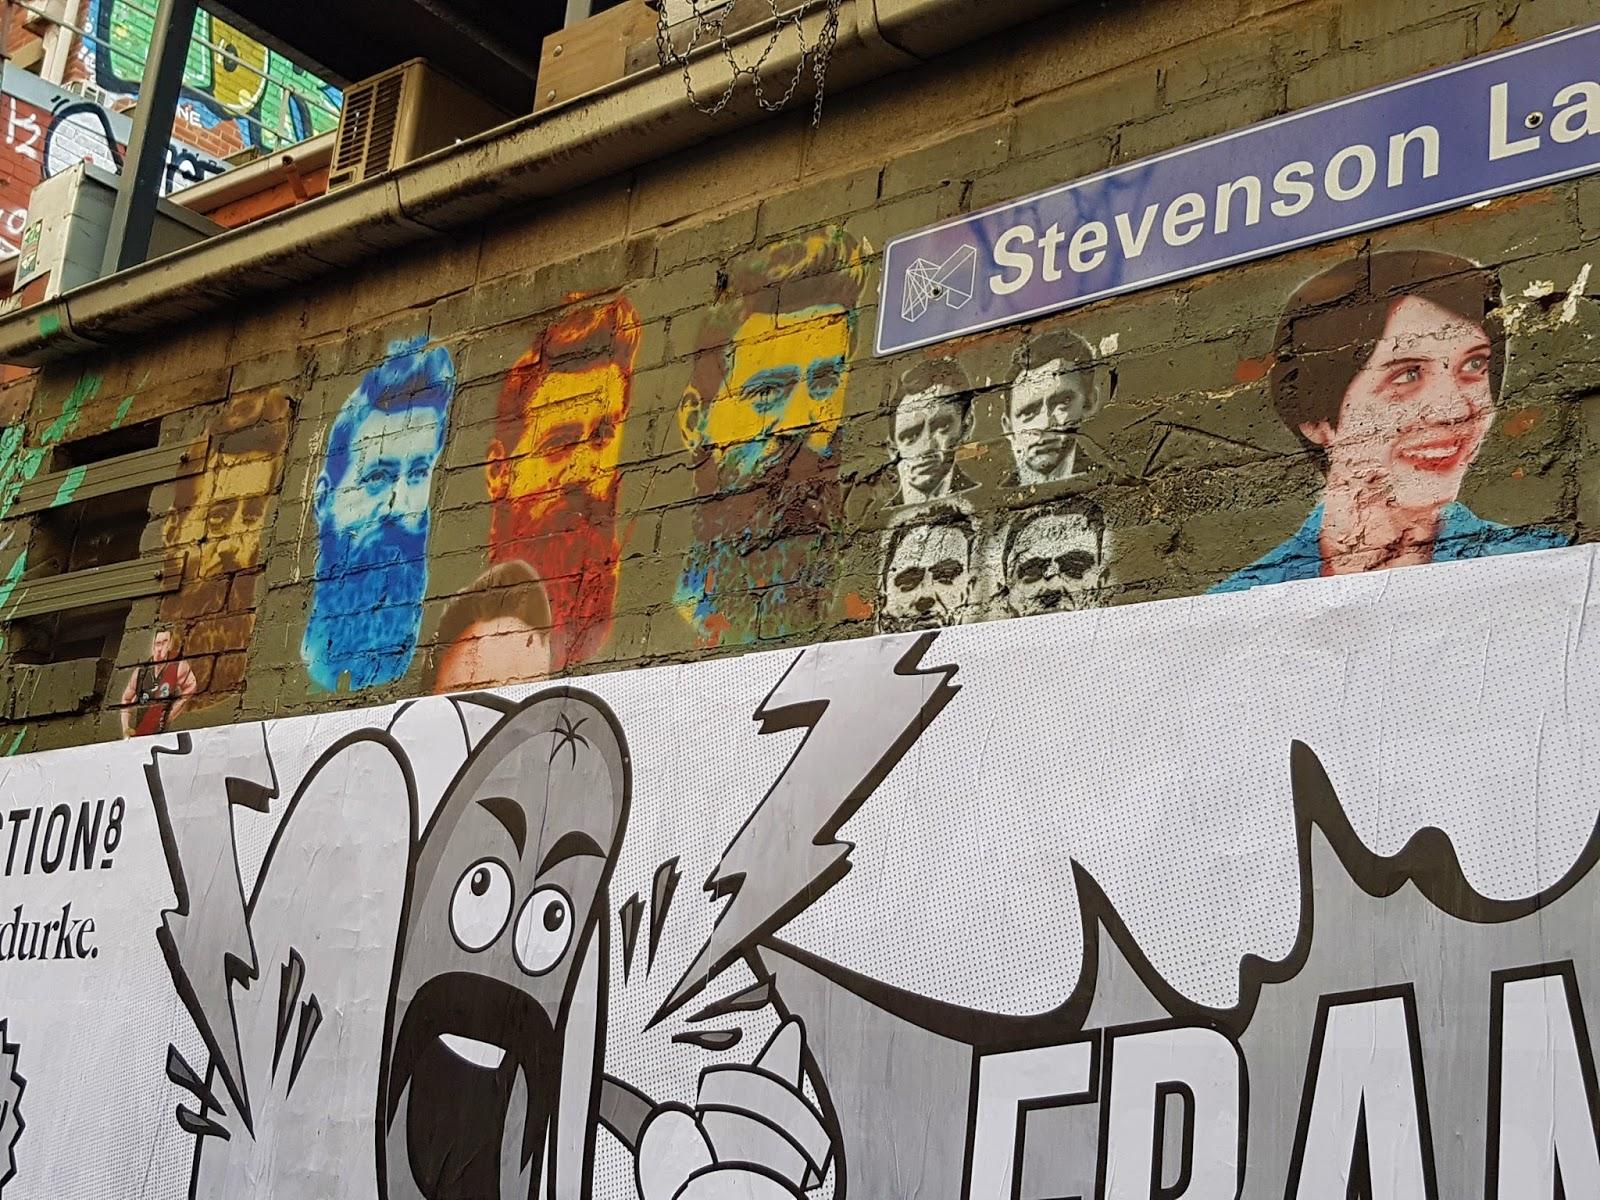 Melbourne: Street Art and Graffiti Chronicles